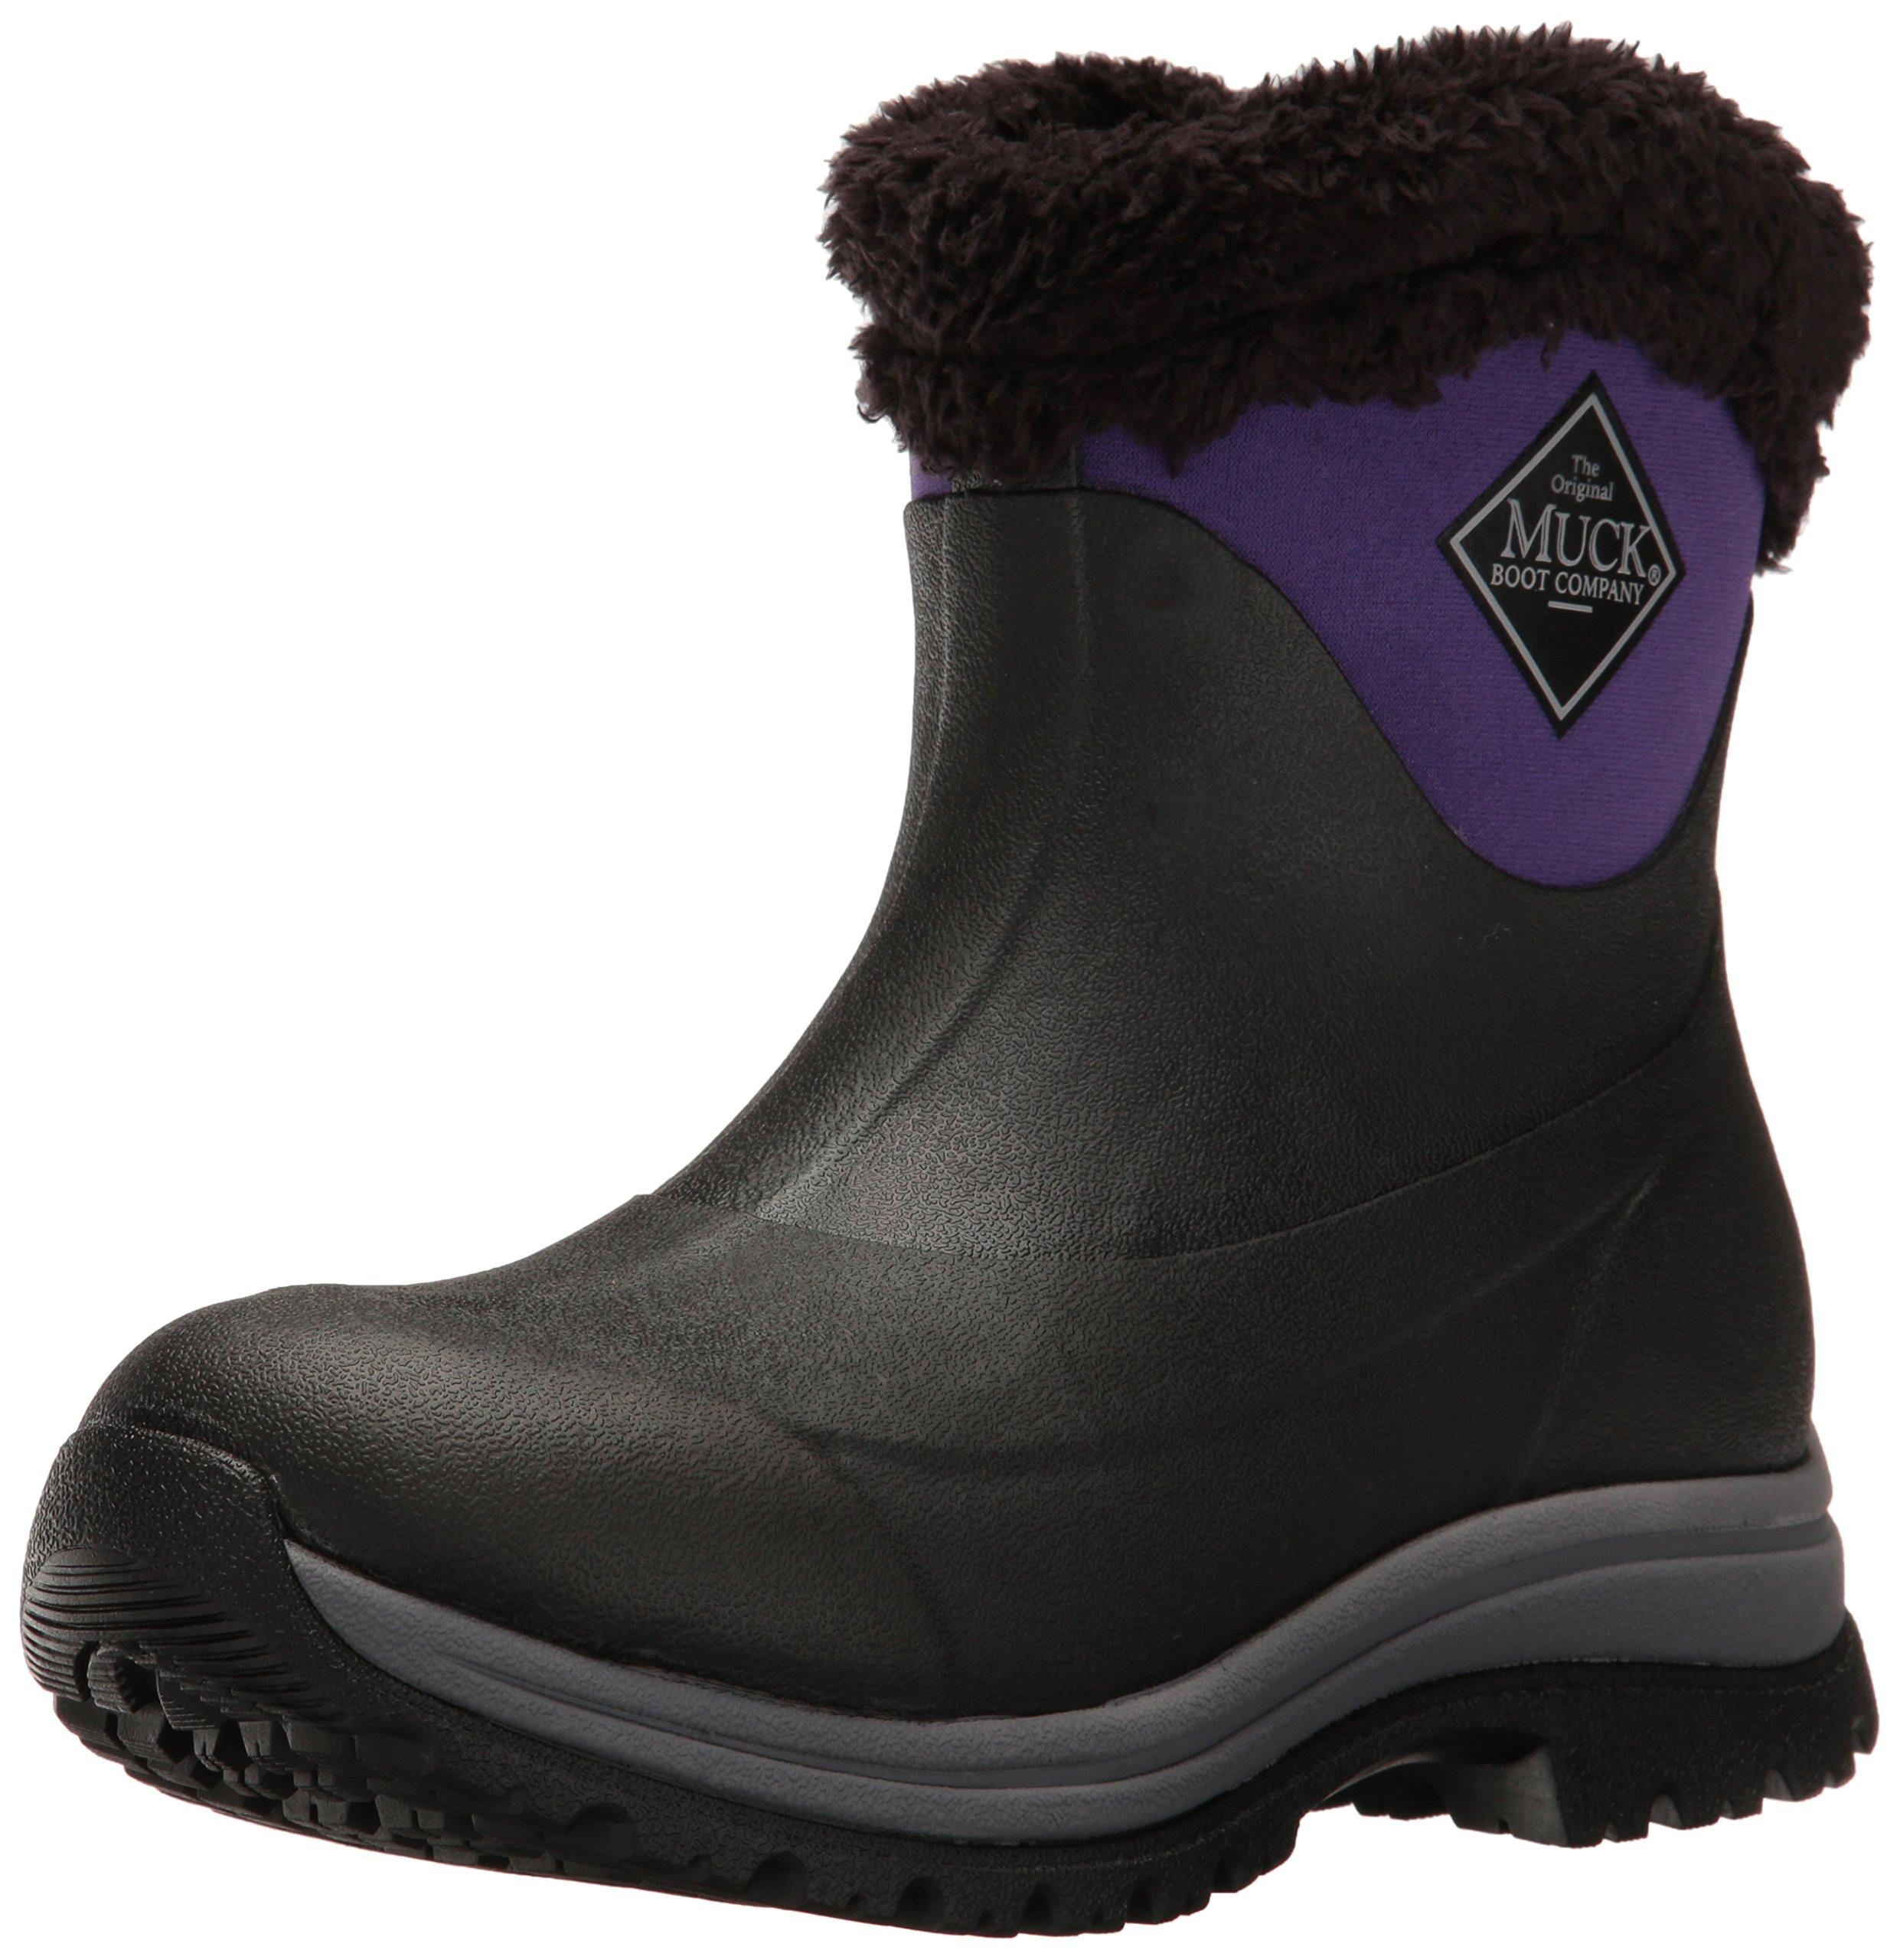 Muck Boot Women's Arctic Apres Slip-on, Black/Parachute Purple, 10 US/10 M US